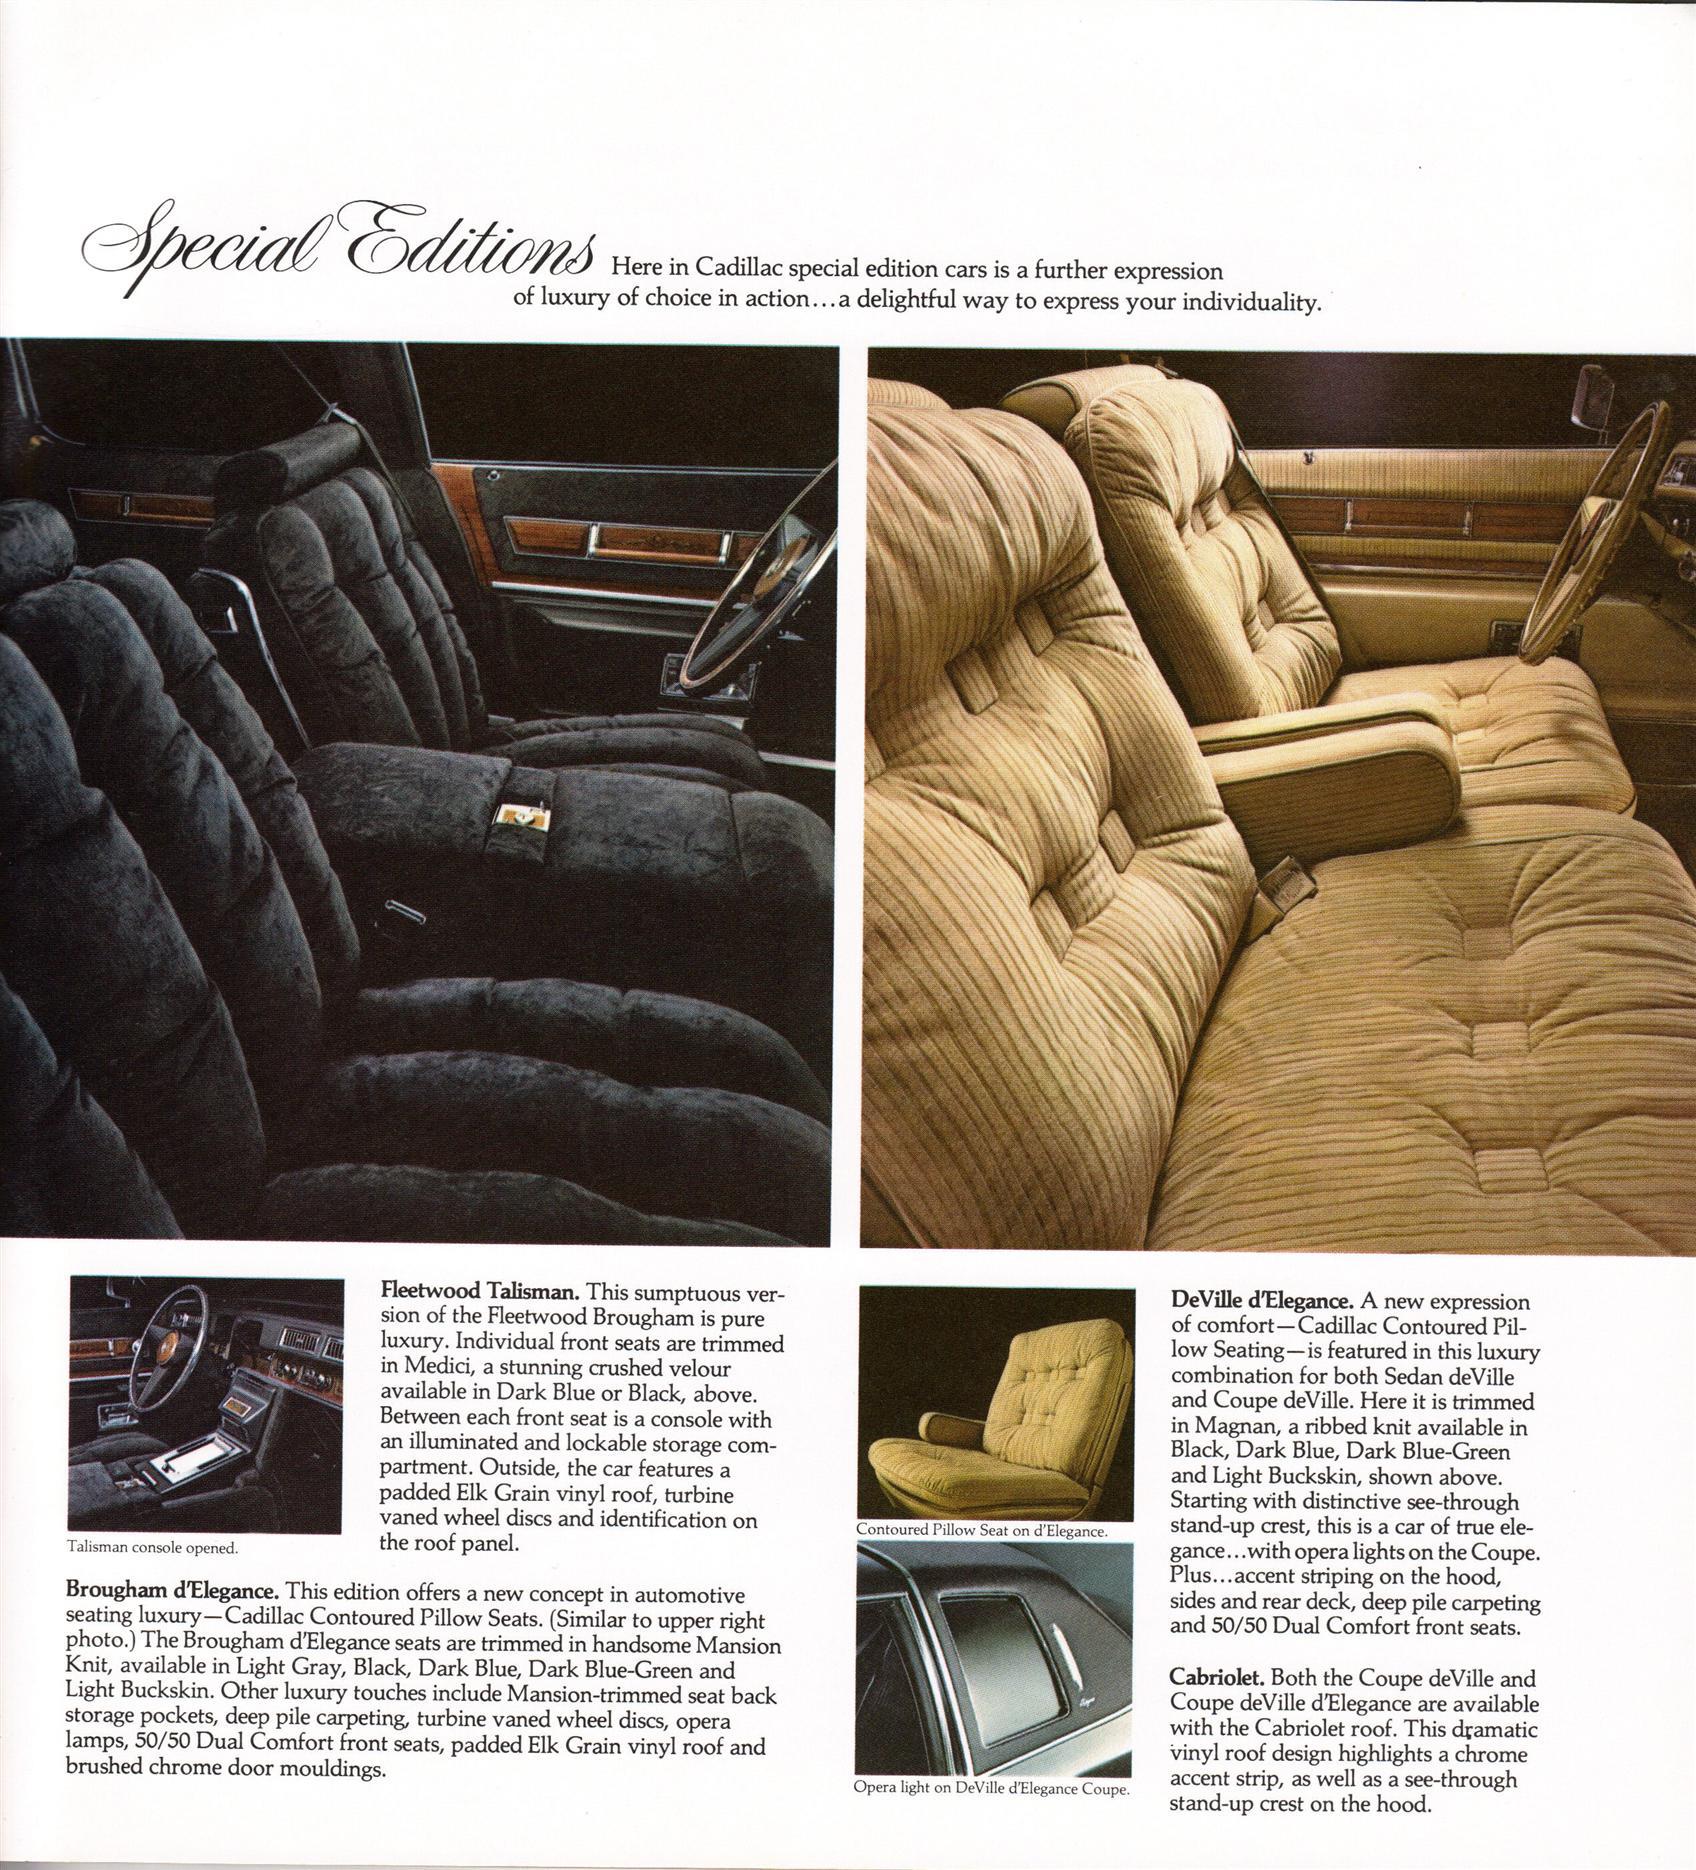 Directory Index: Cadillac/1976_Cadillac/1976_Cadillac_Brochure